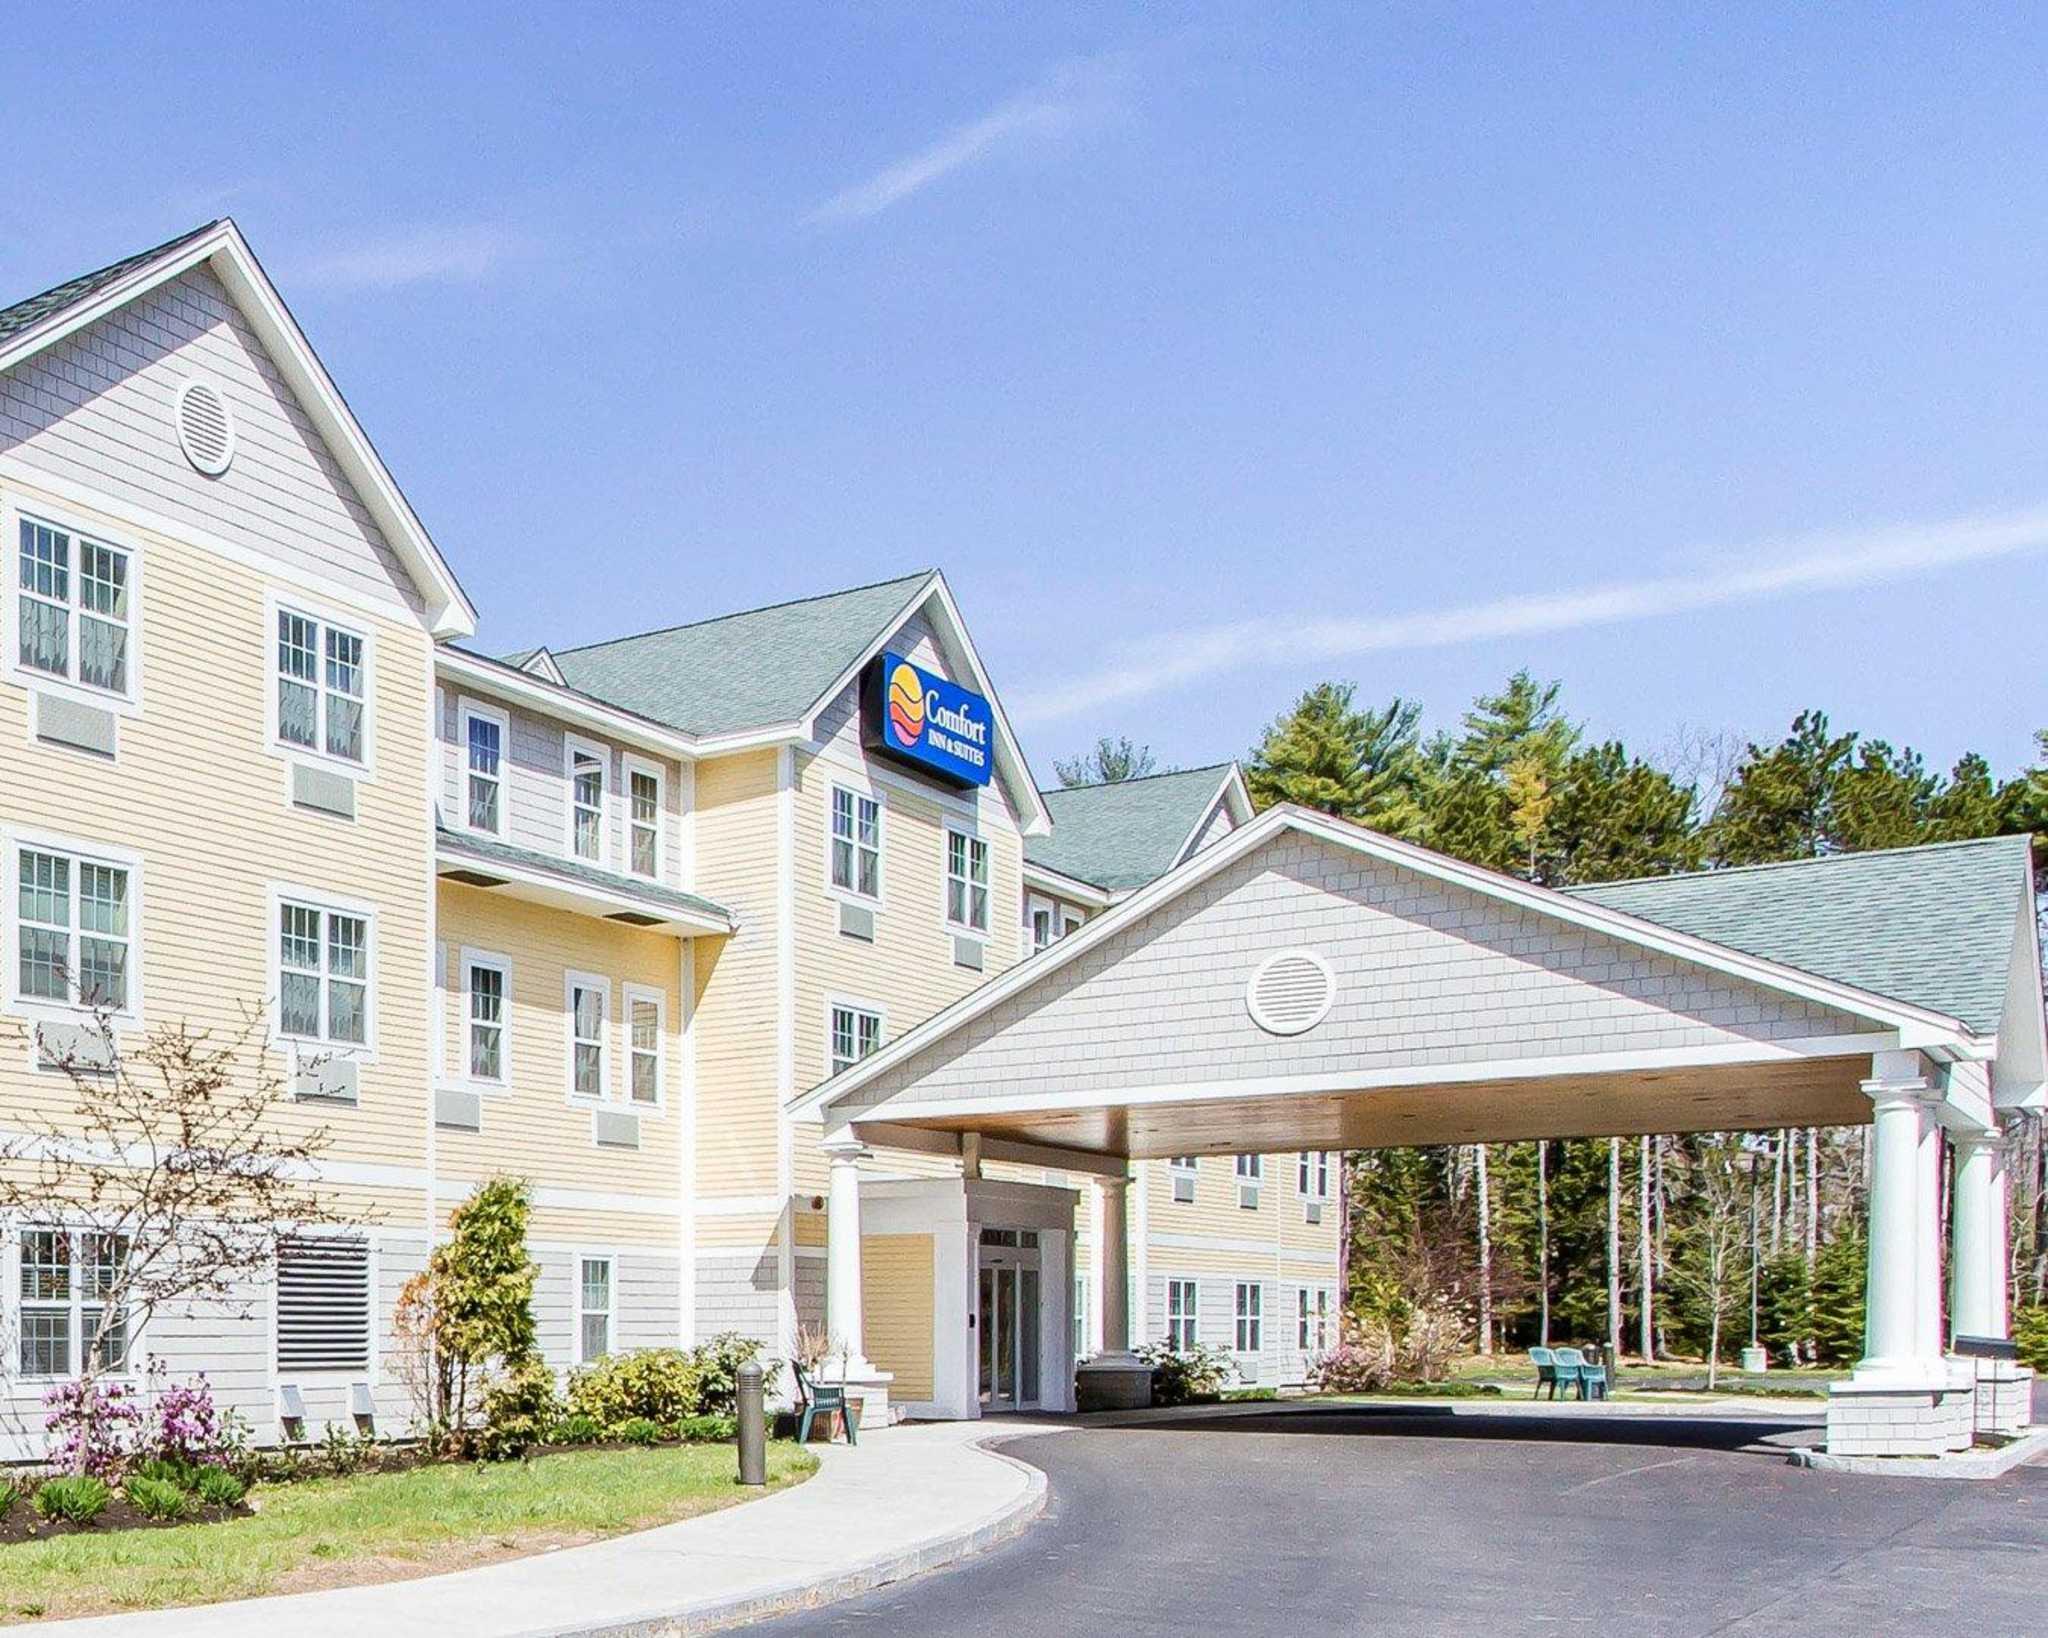 comfort inn suites scarborough portland at 329 us route. Black Bedroom Furniture Sets. Home Design Ideas